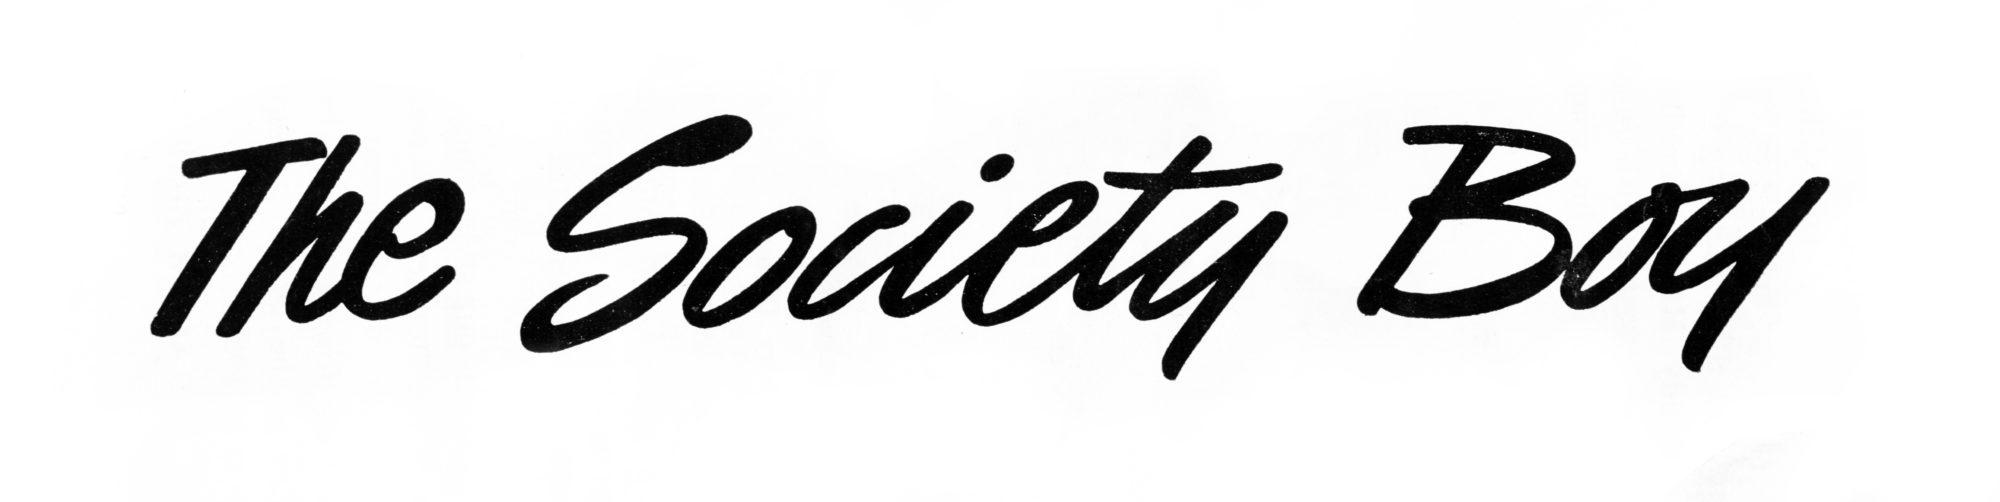 The Society Boy